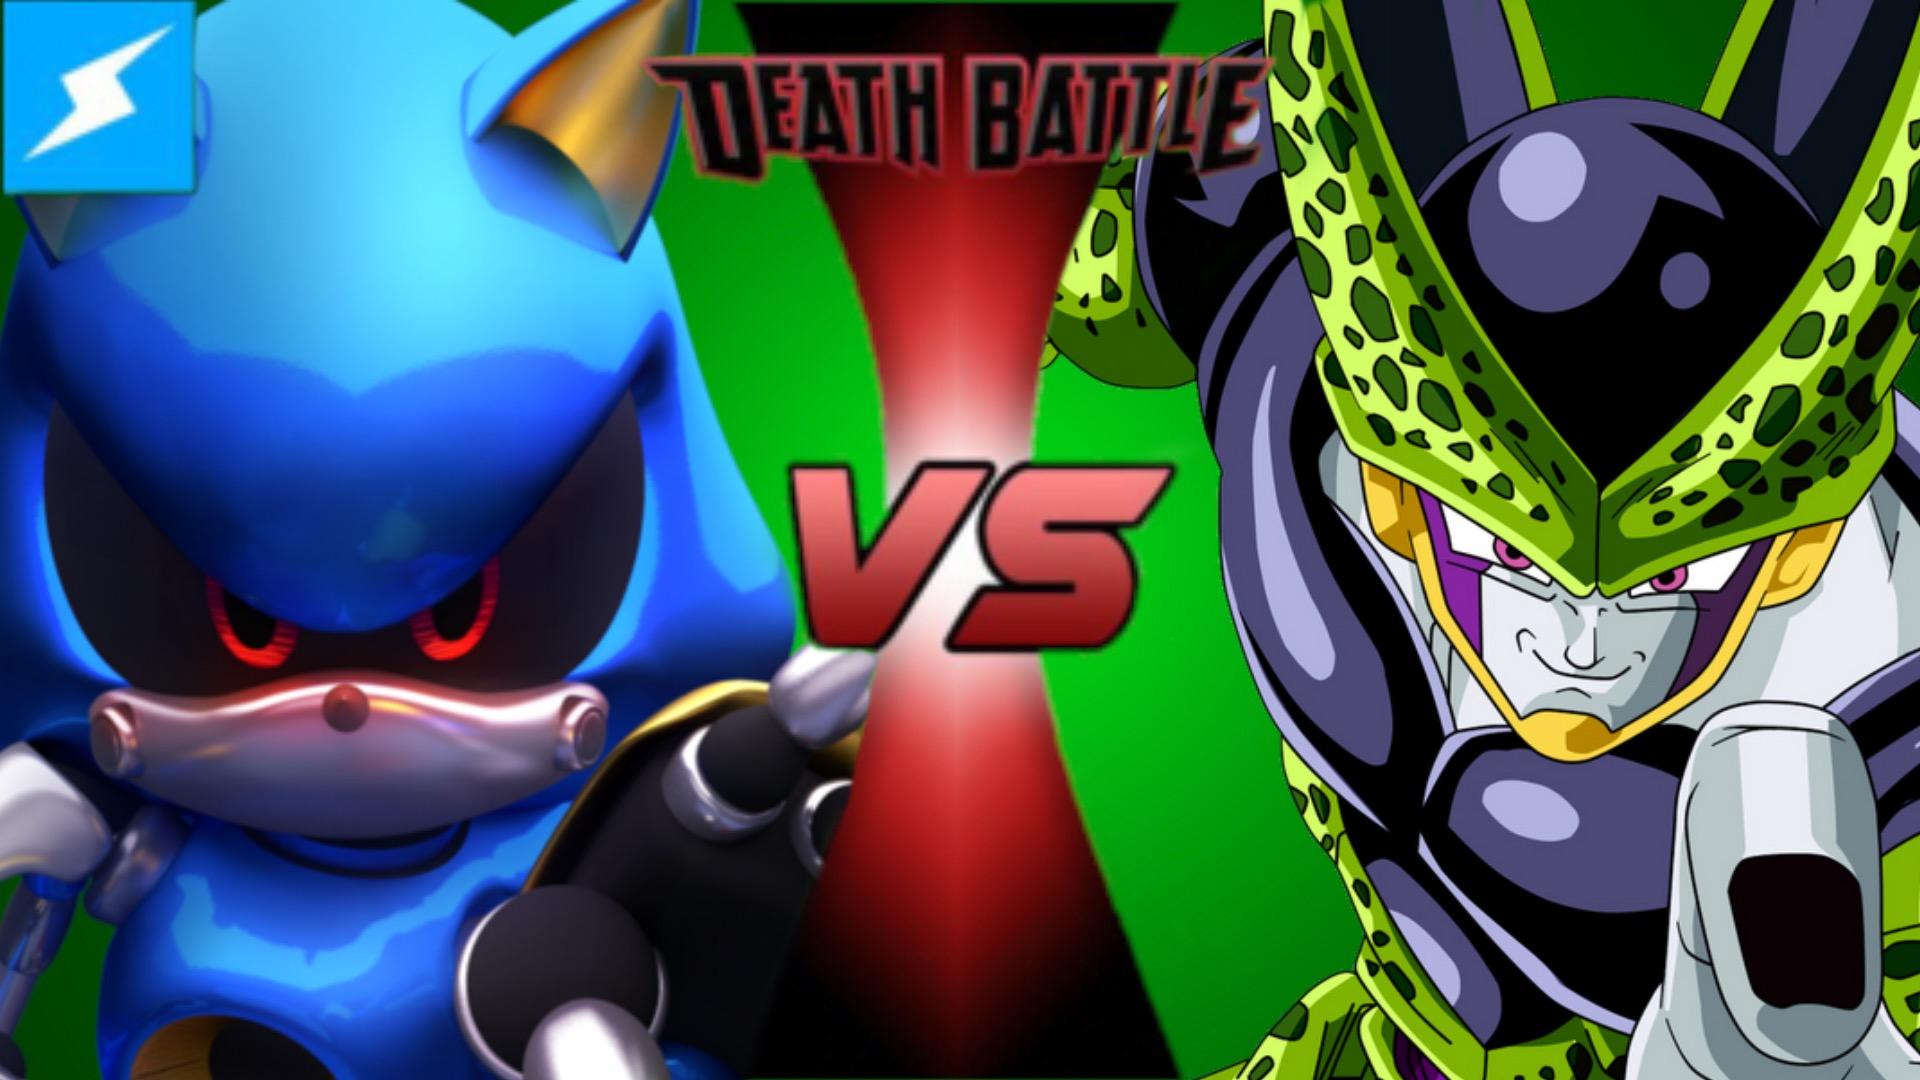 Metal Sonic V3 0 Vs Battles Wiki Fandom Powered By Wikia - Imagez co